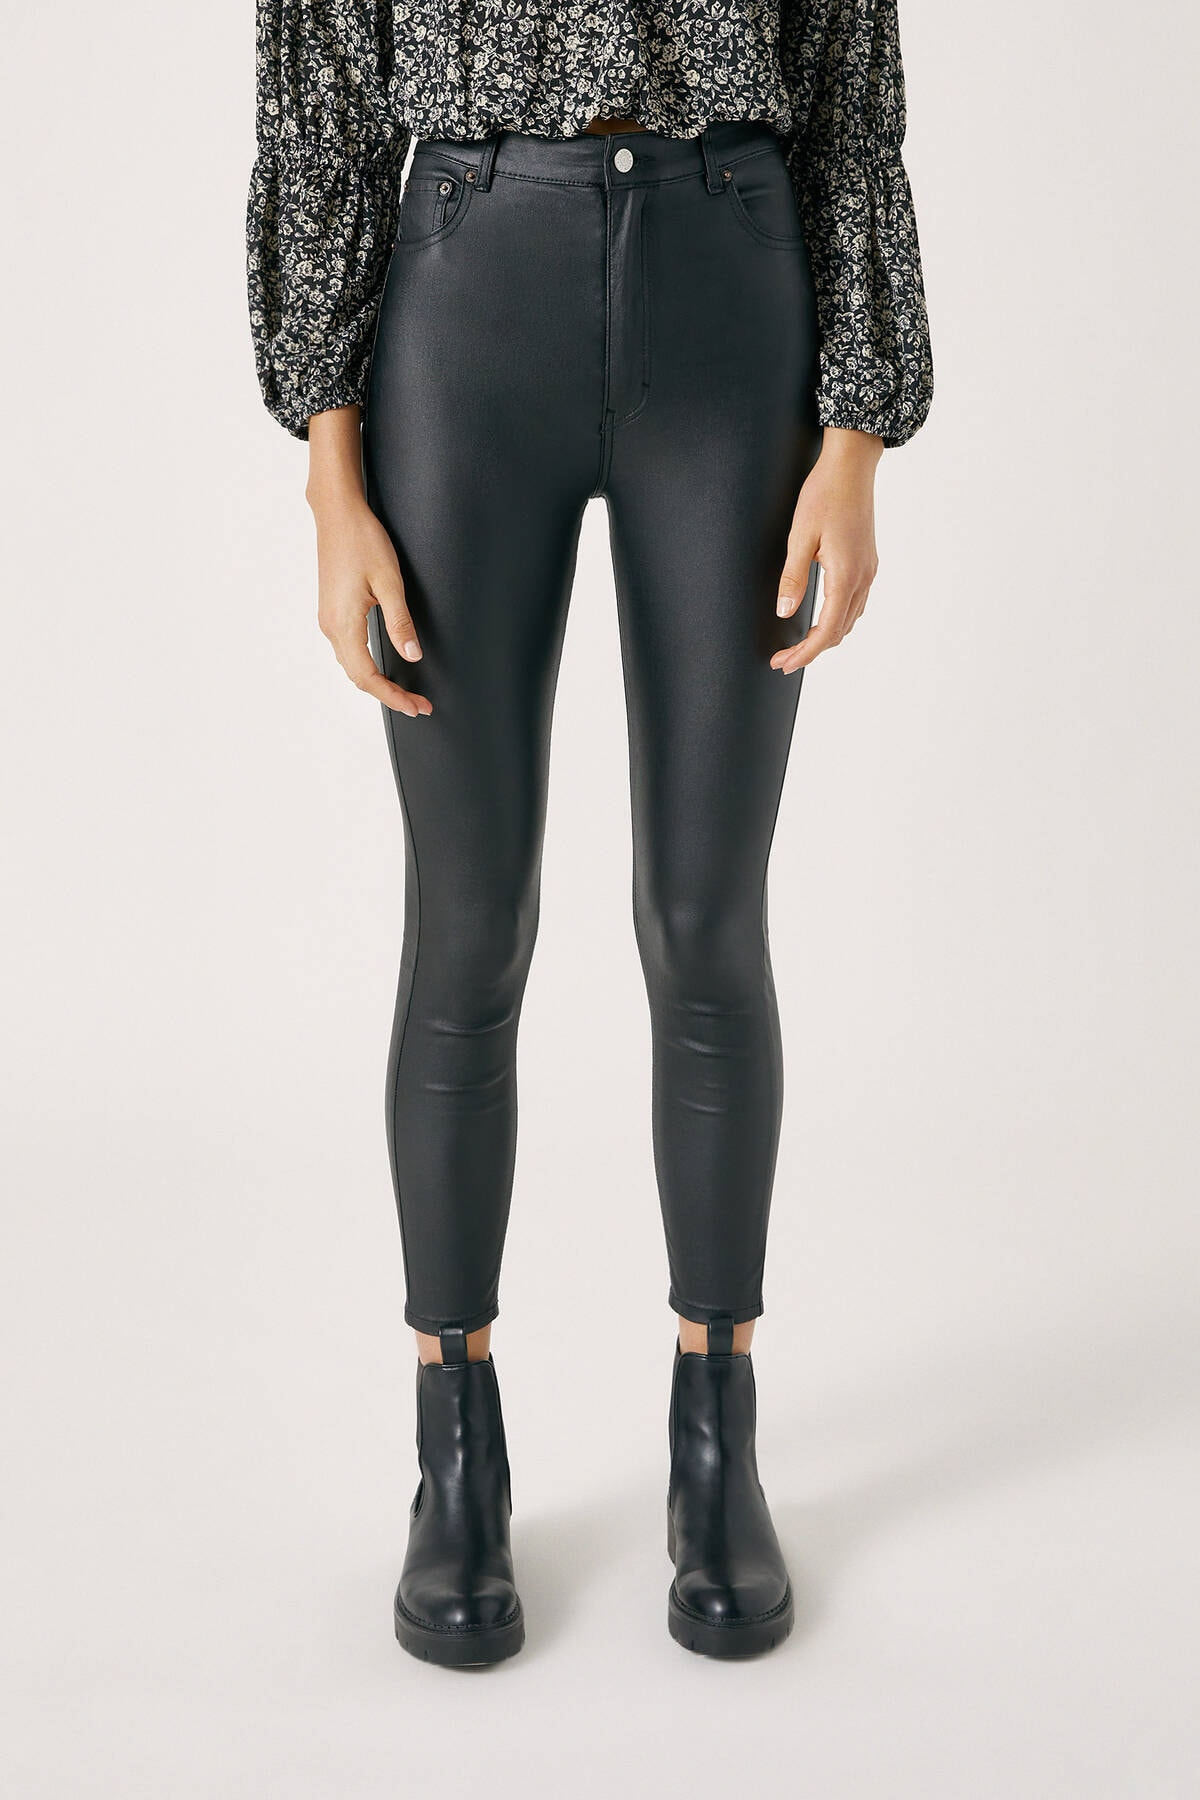 Pull & Bear Kadın Siyah High Waist Basic Jeans 09678311 1